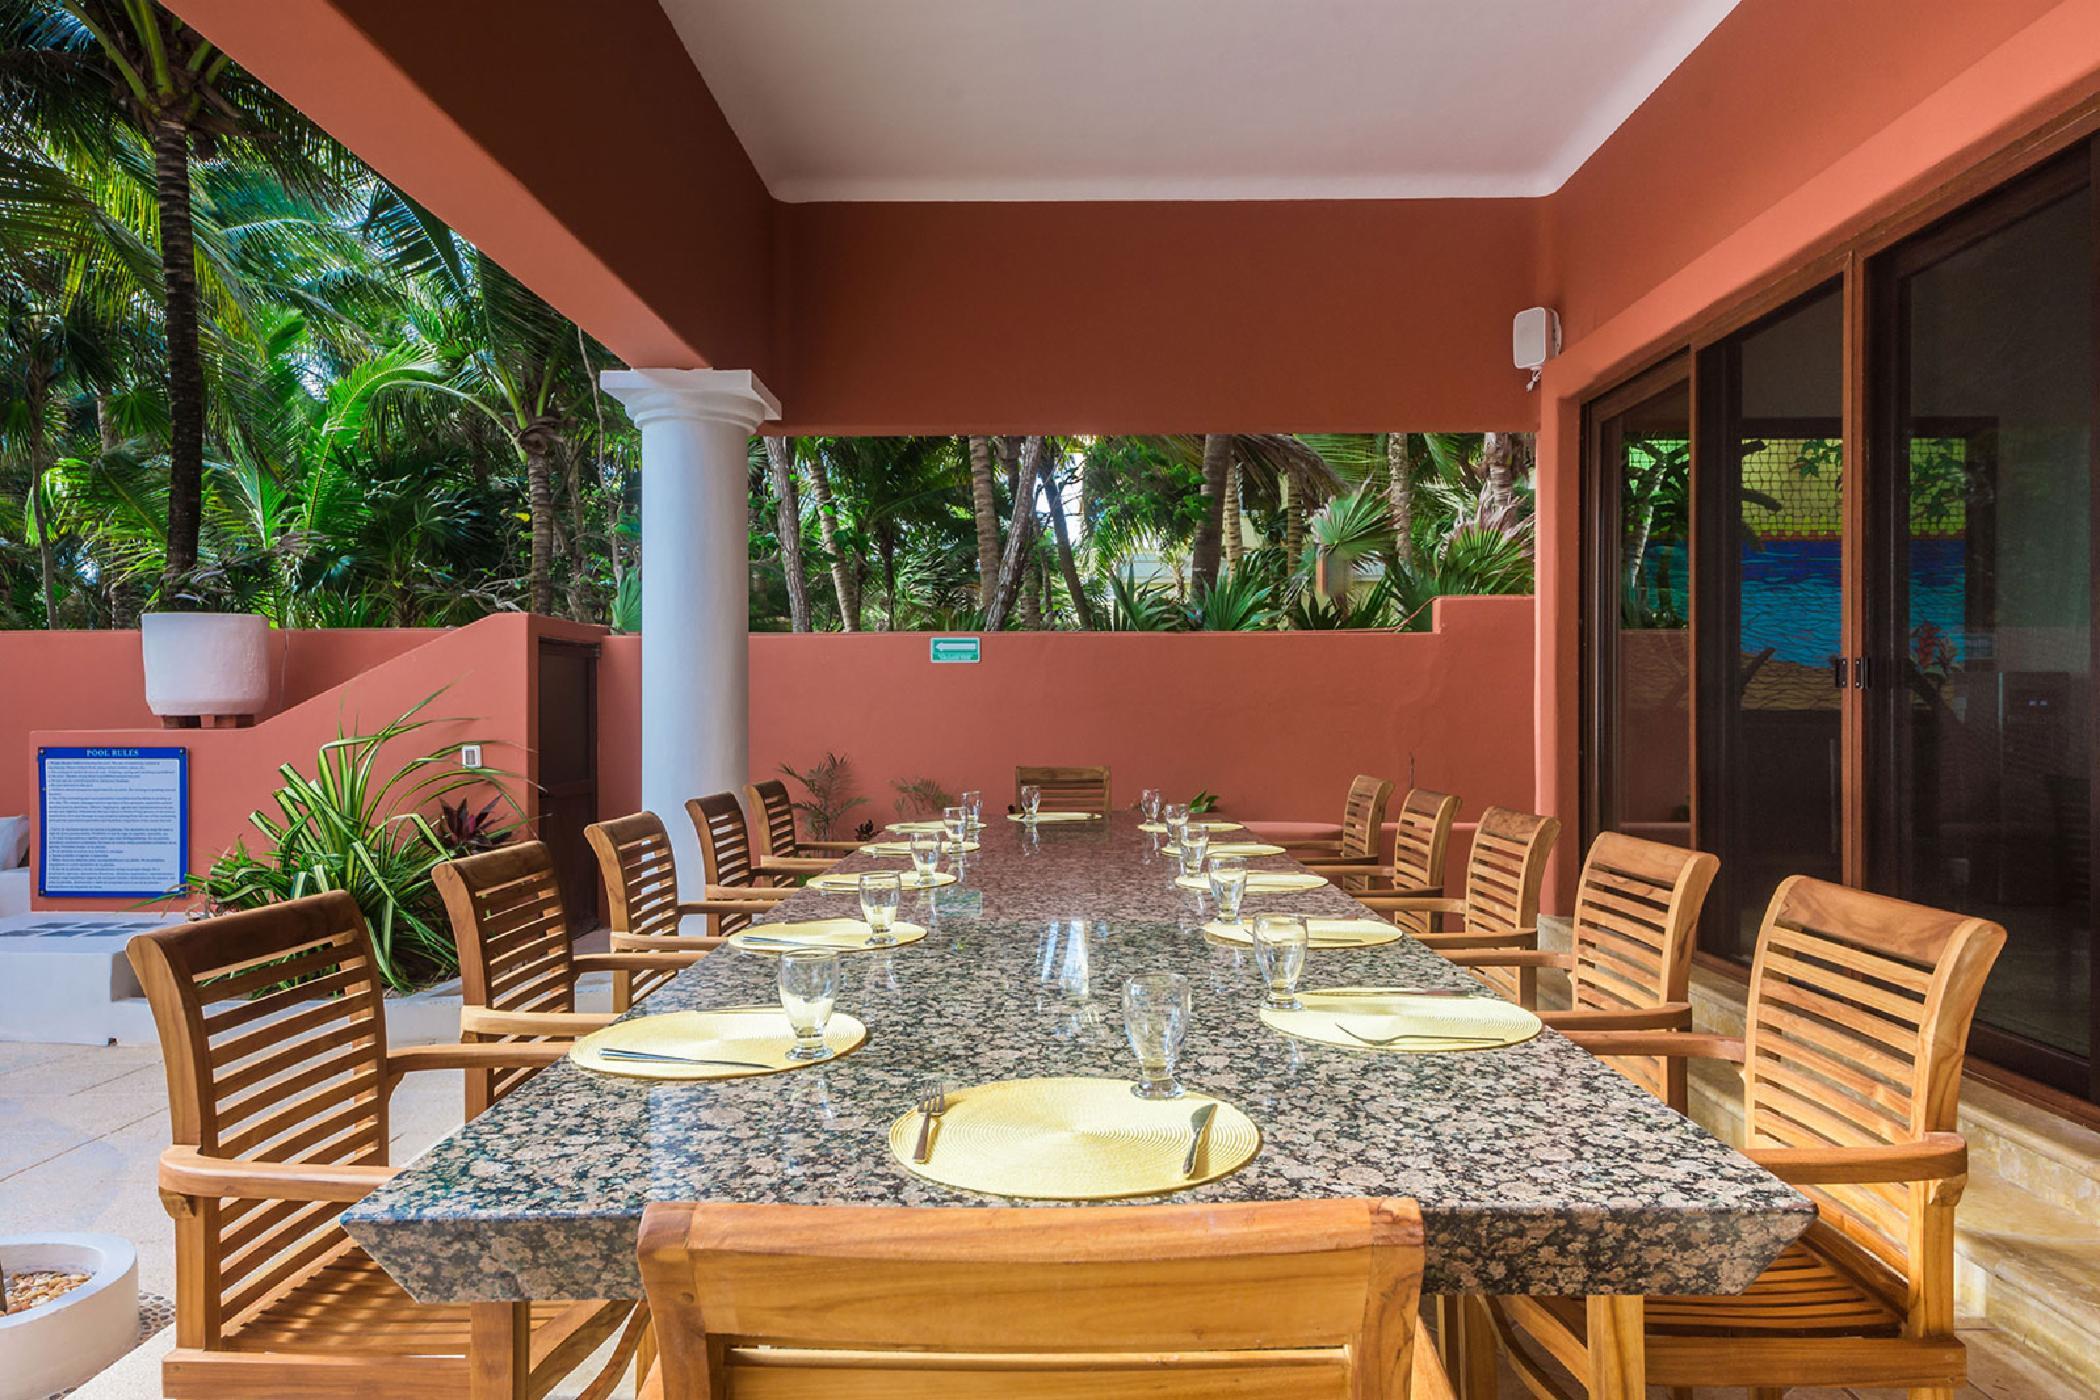 Agents_Maya_Luxe_Riviera_Maya_Luxury_Villas_Casa_Yardena10.jpg